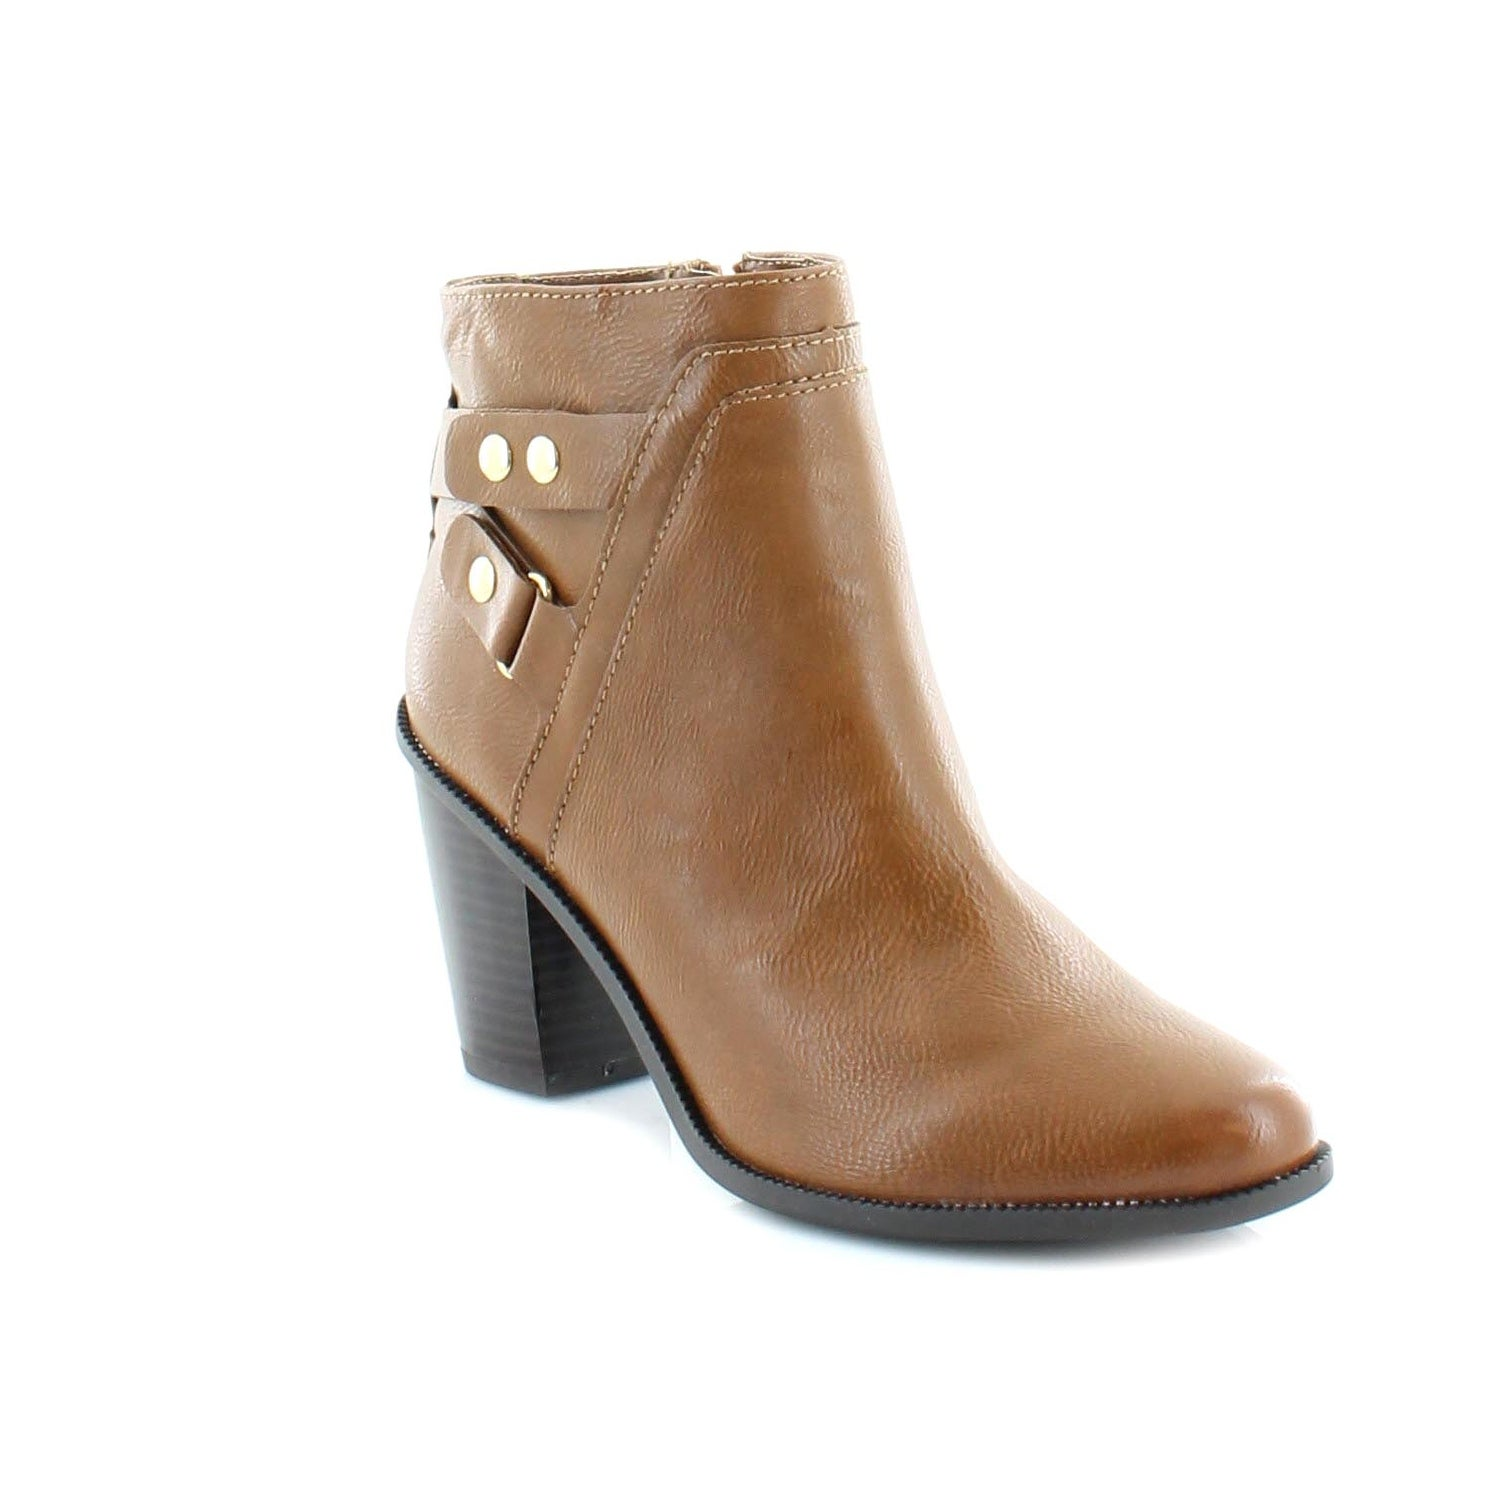 78234f14fba Shop Bar III Dove Women s Boots Banana Bread - Free Shipping On ...